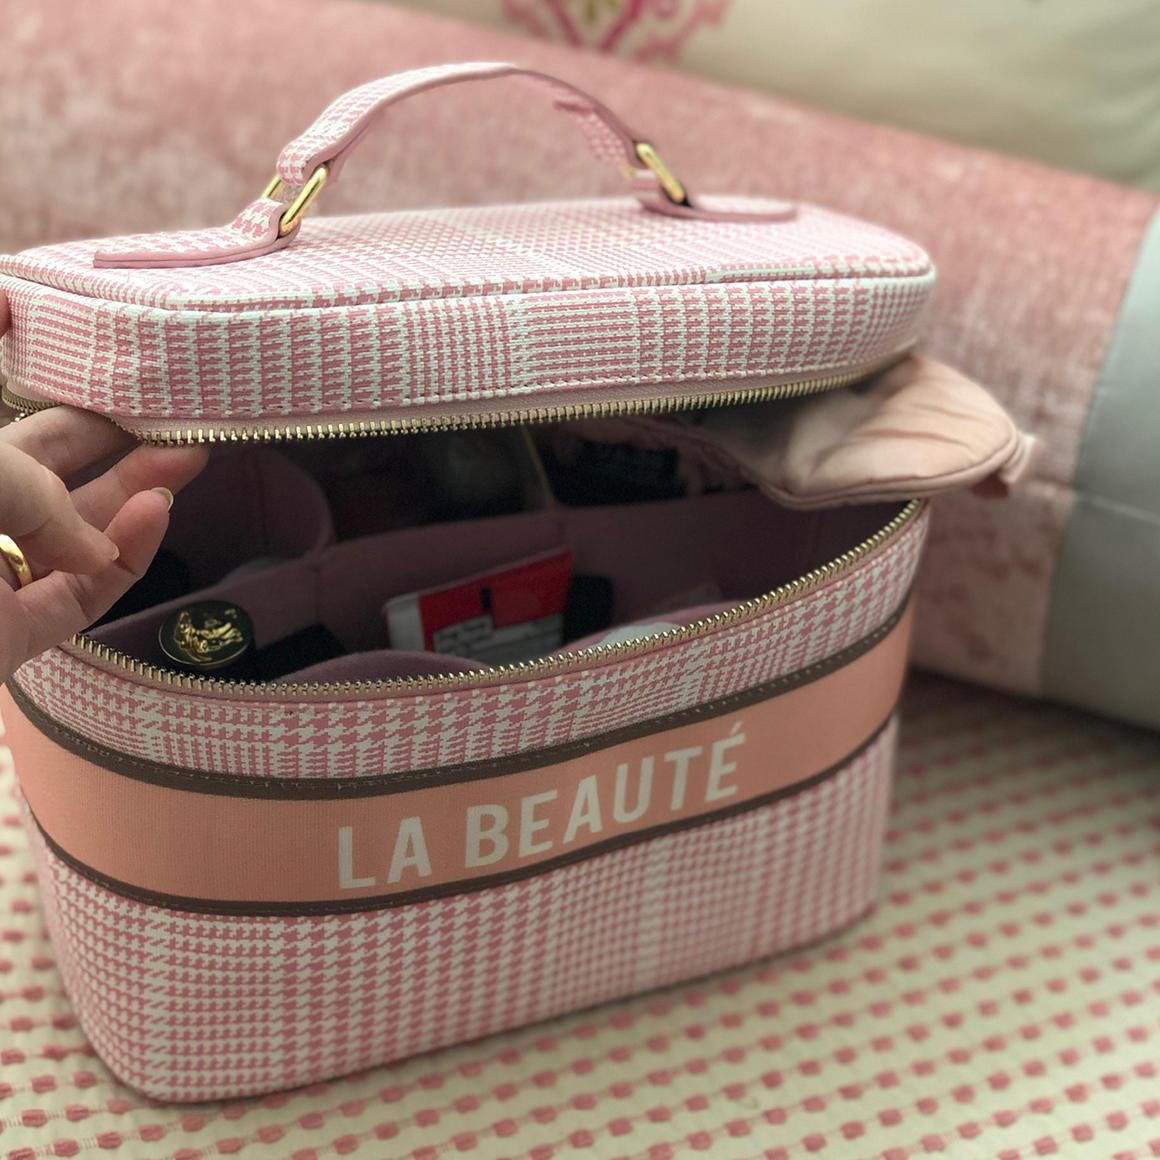 La Beaute Travel Beauty Case | Trada Marketplace